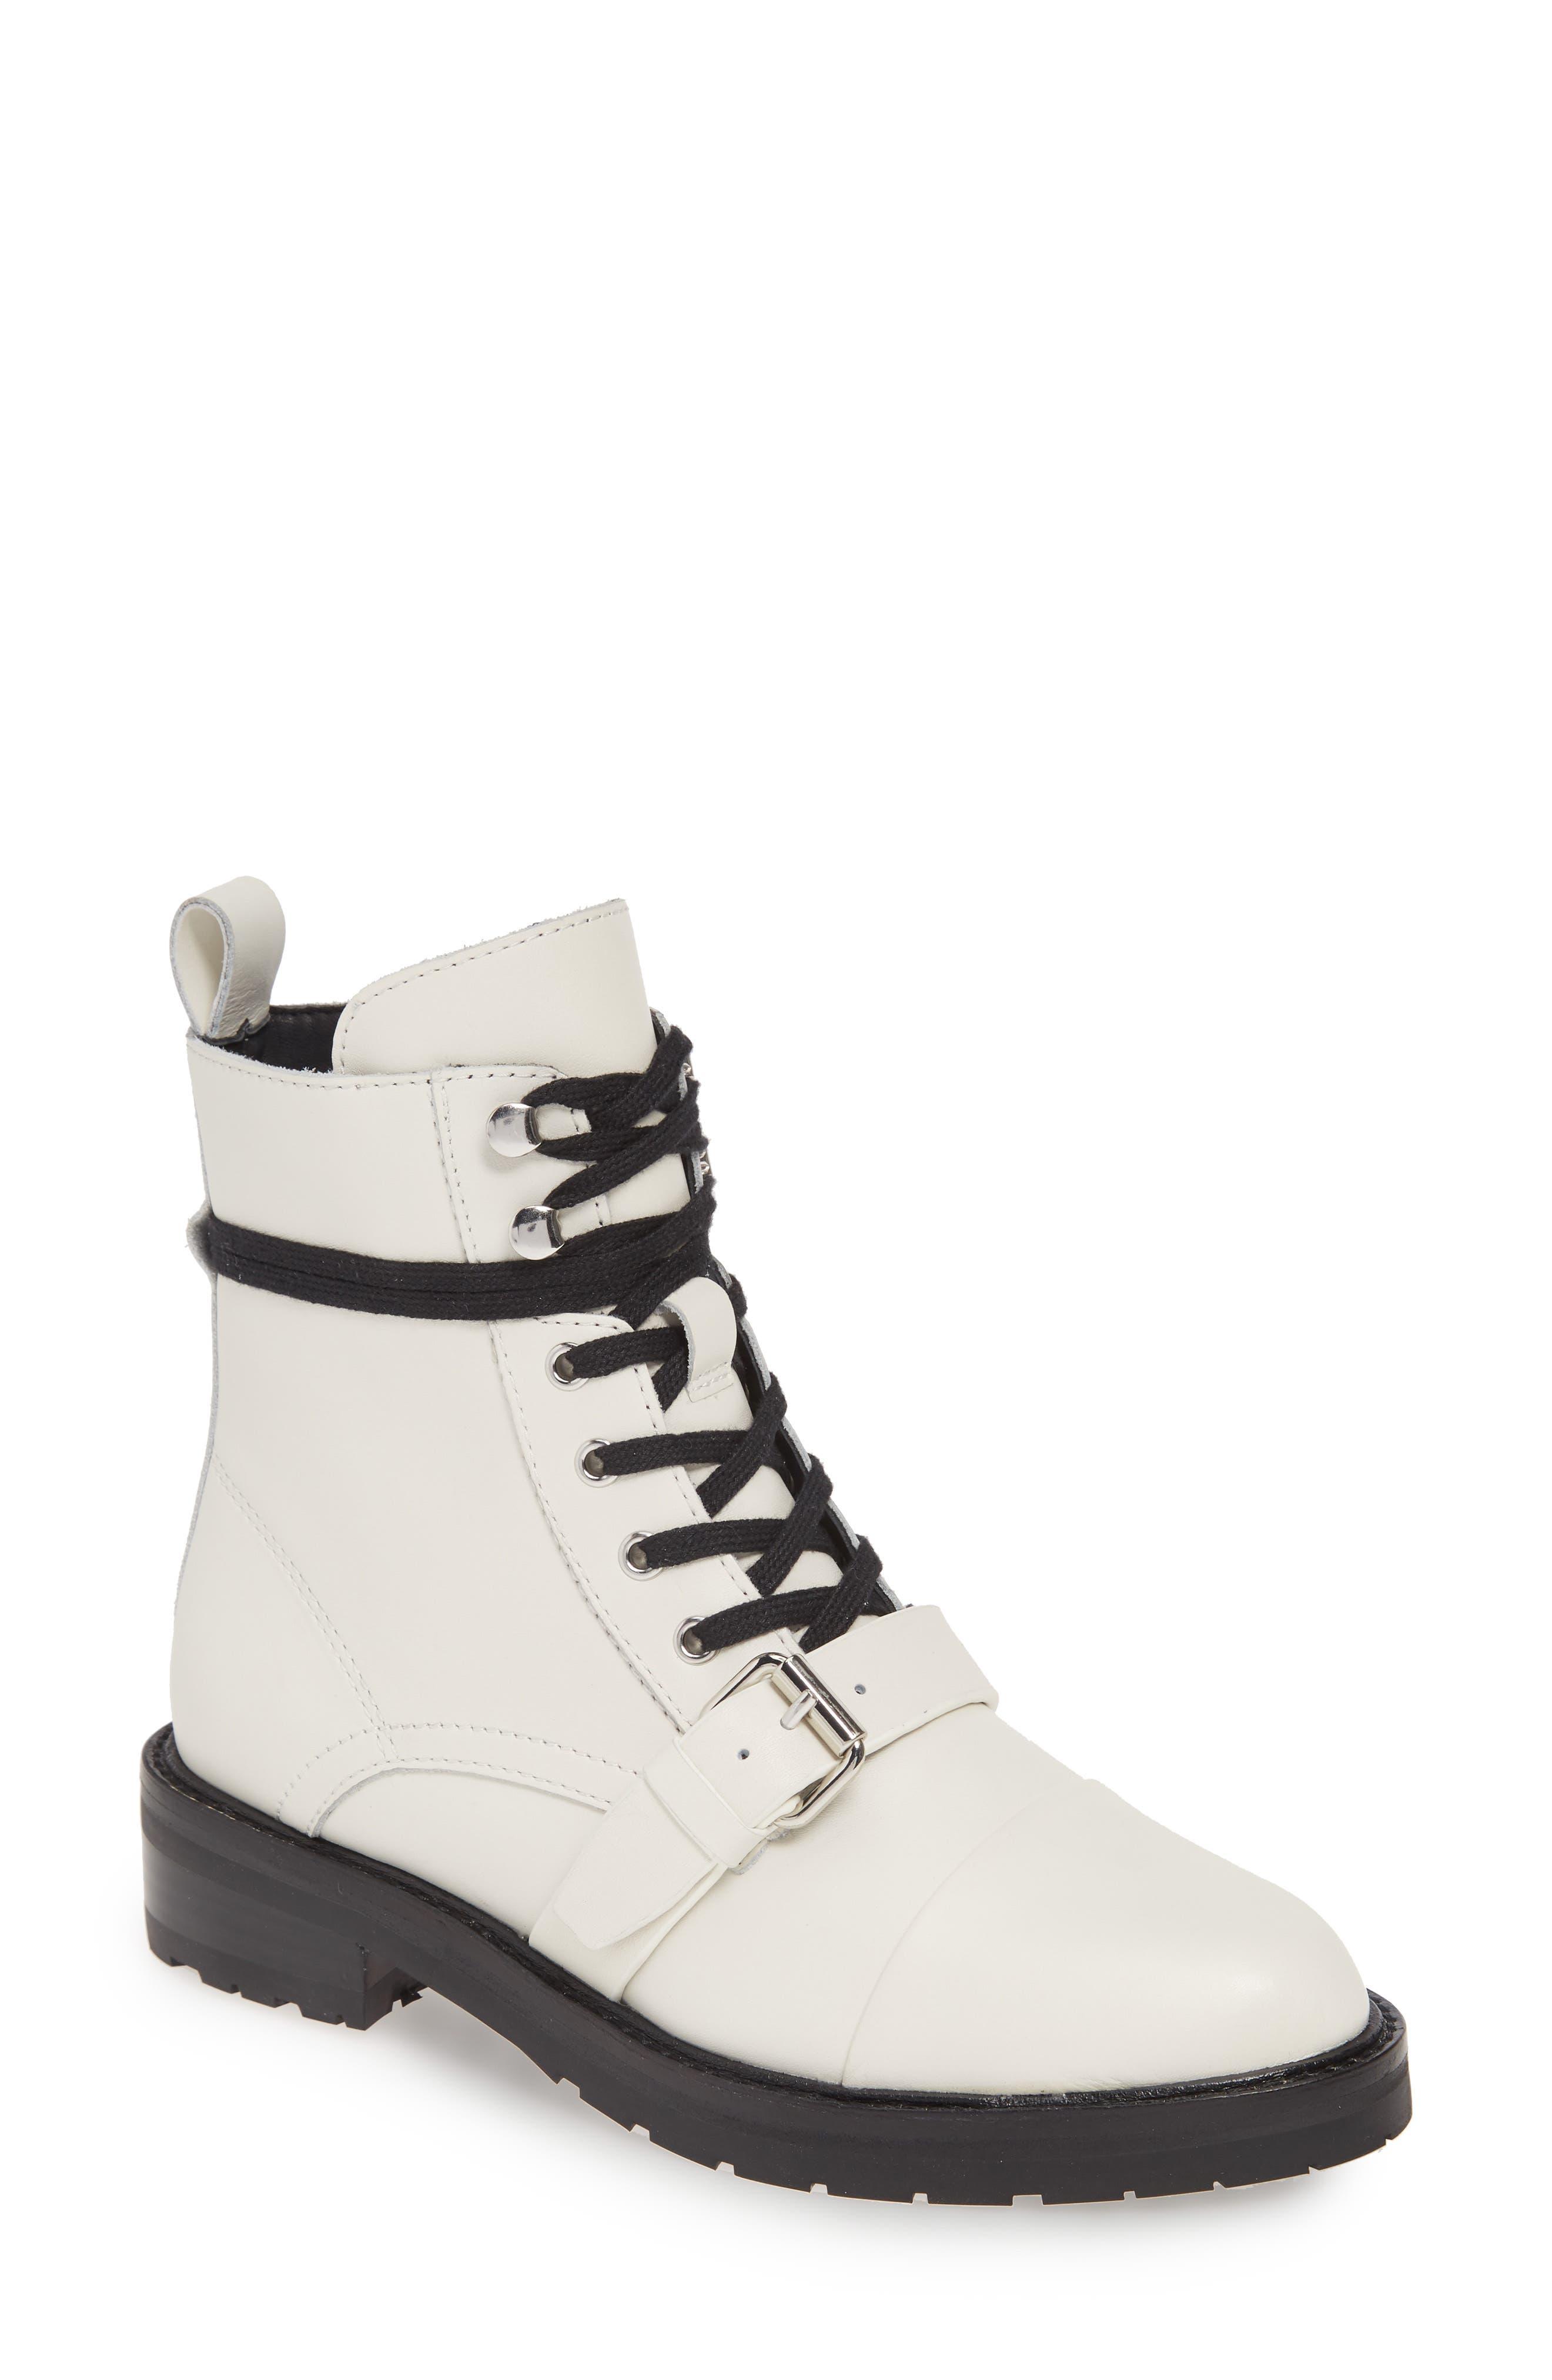 Women's White Combat Boots | Nordstrom